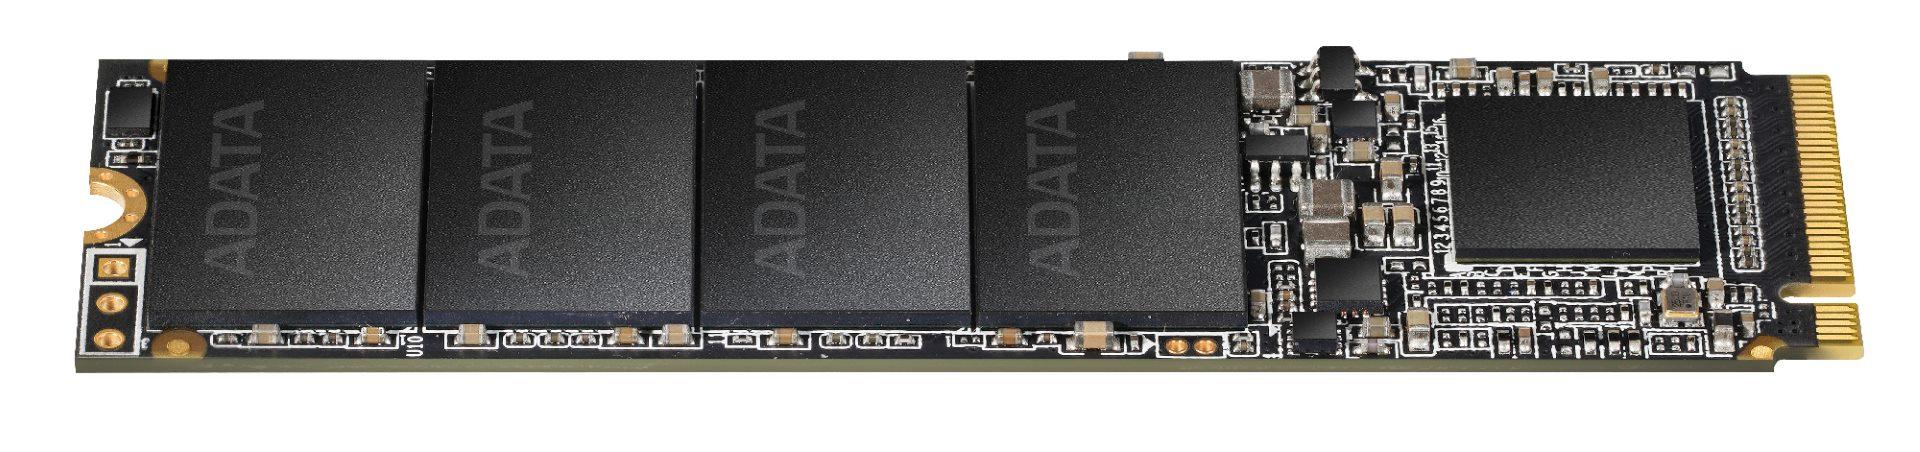 ADATA представила SSD XPG GAMMIX S11 Pro и SX6000 Lite